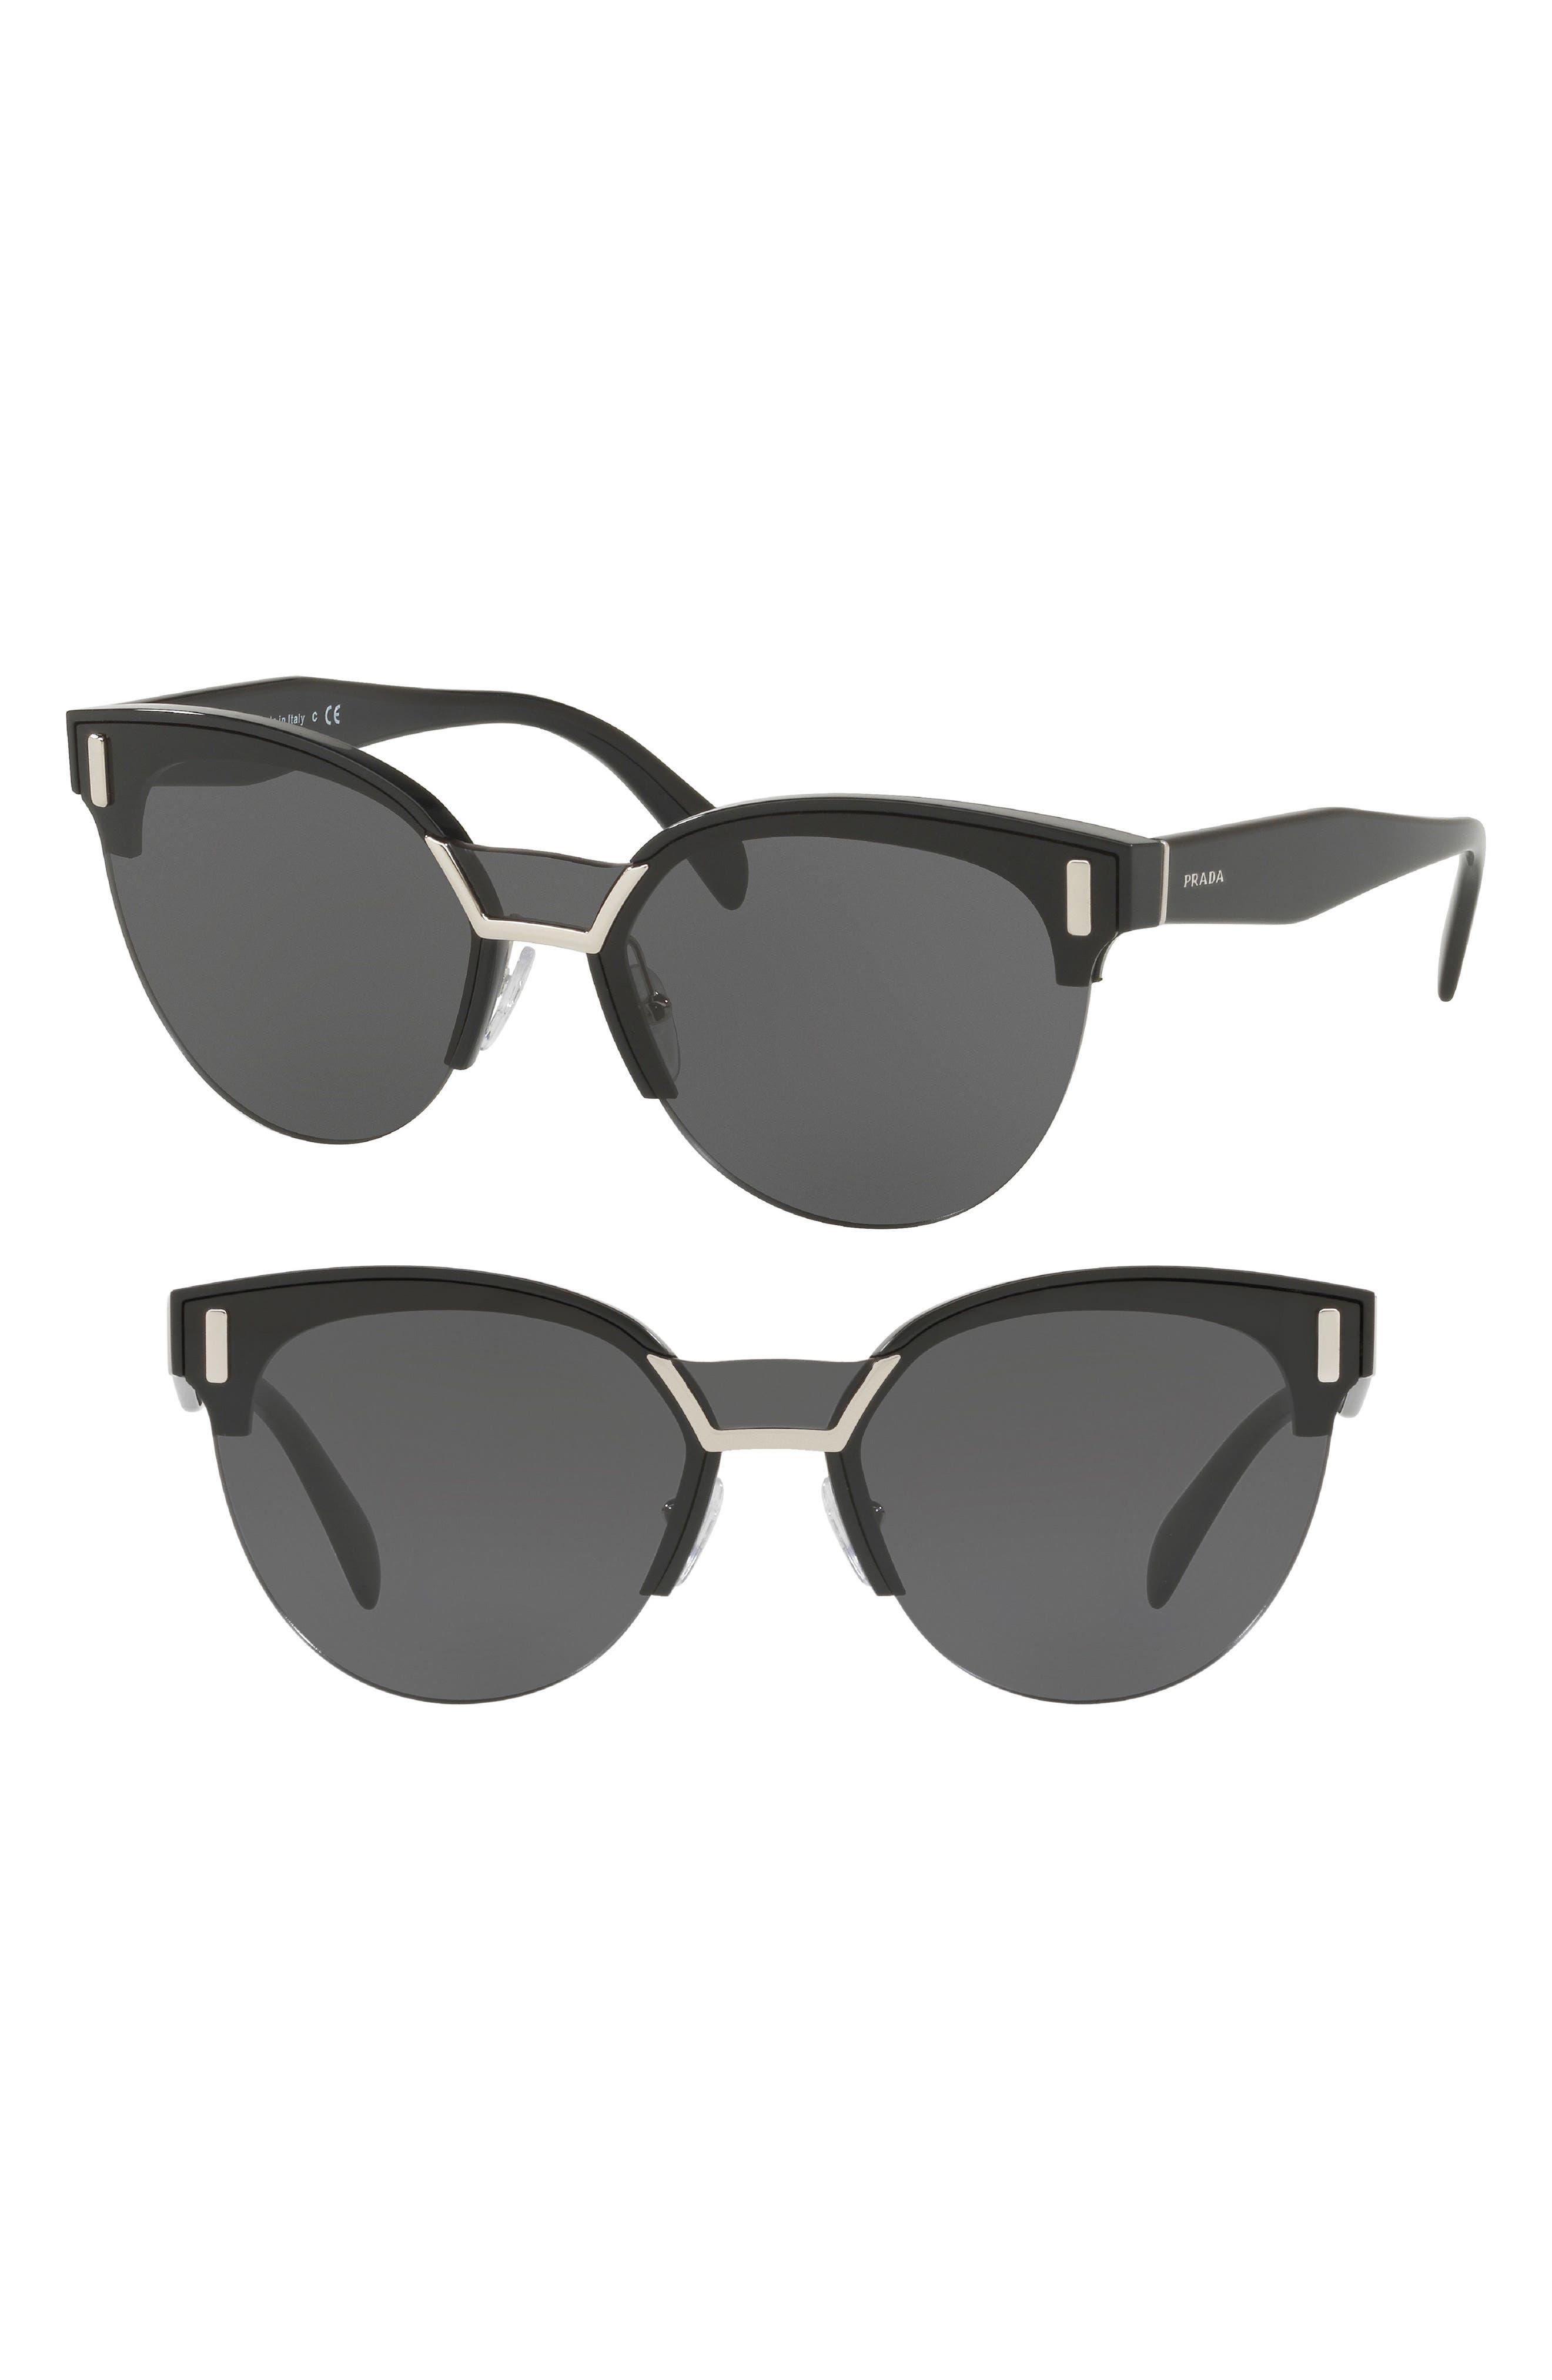 50mm Angular Sunglasses,                             Alternate thumbnail 2, color,                             001